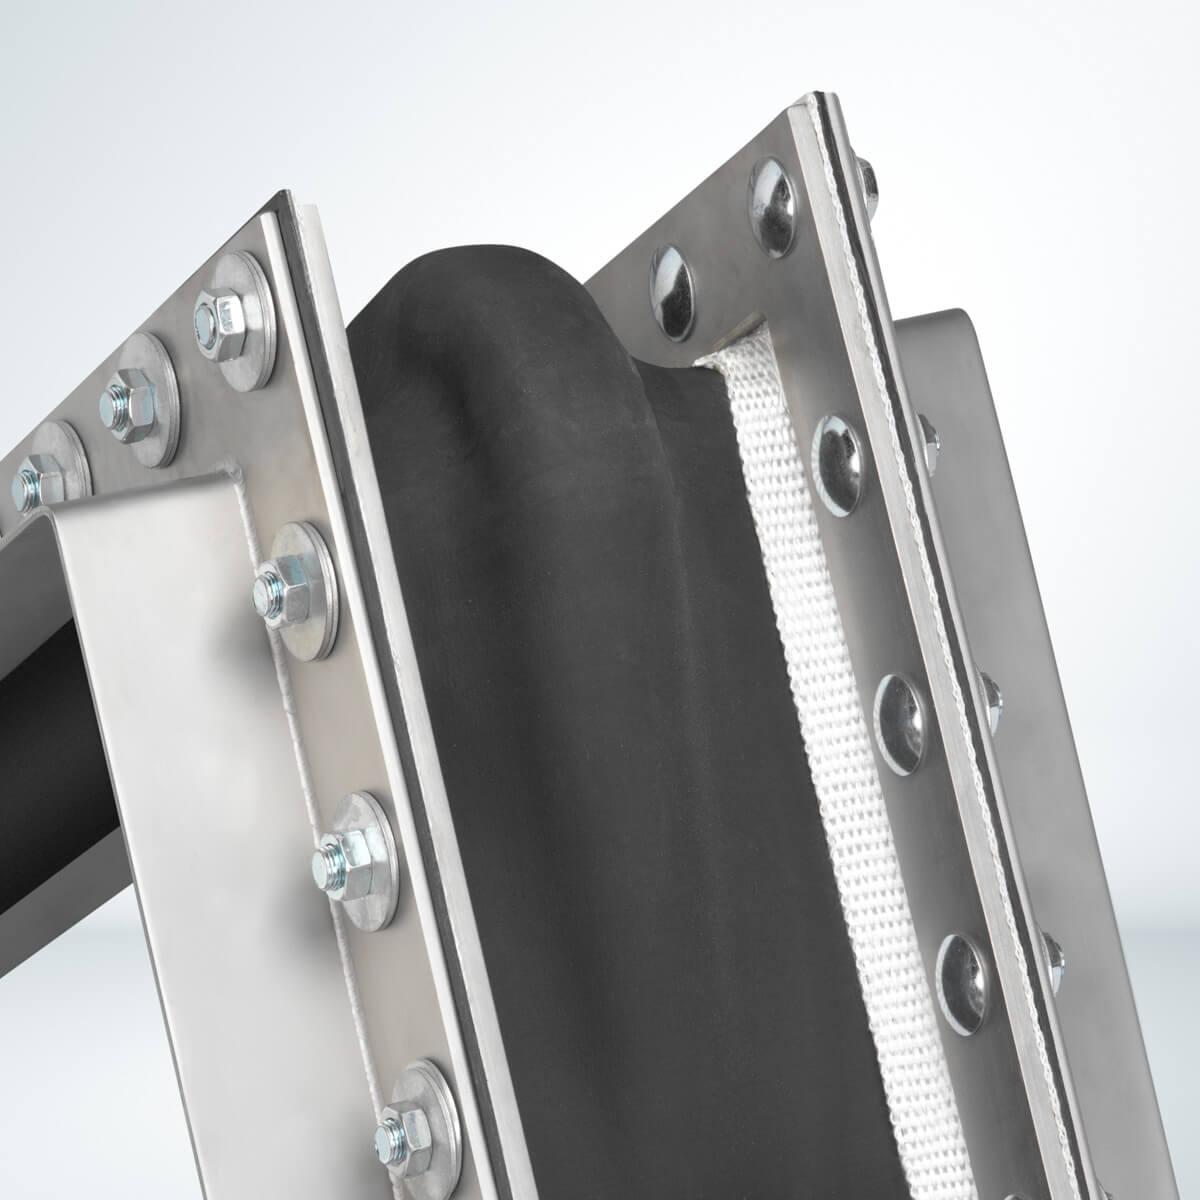 Elastomer expansion joints - Frenzelit GmbH